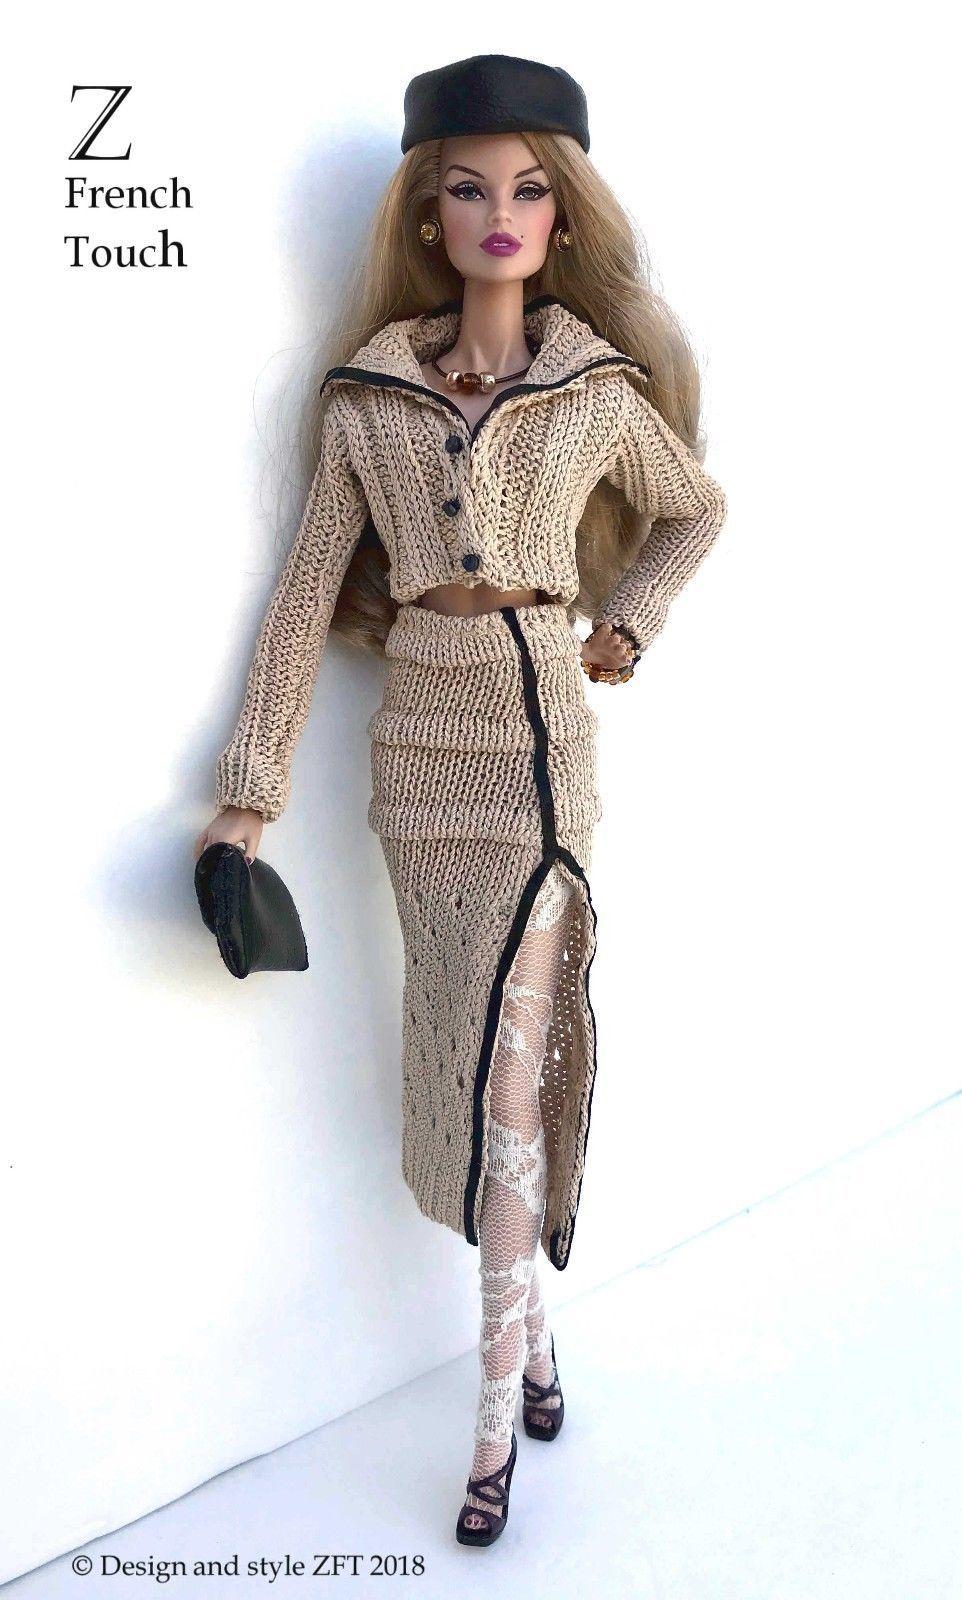 Vintage Style Ooak Barbie Dress and Sweater Handmade